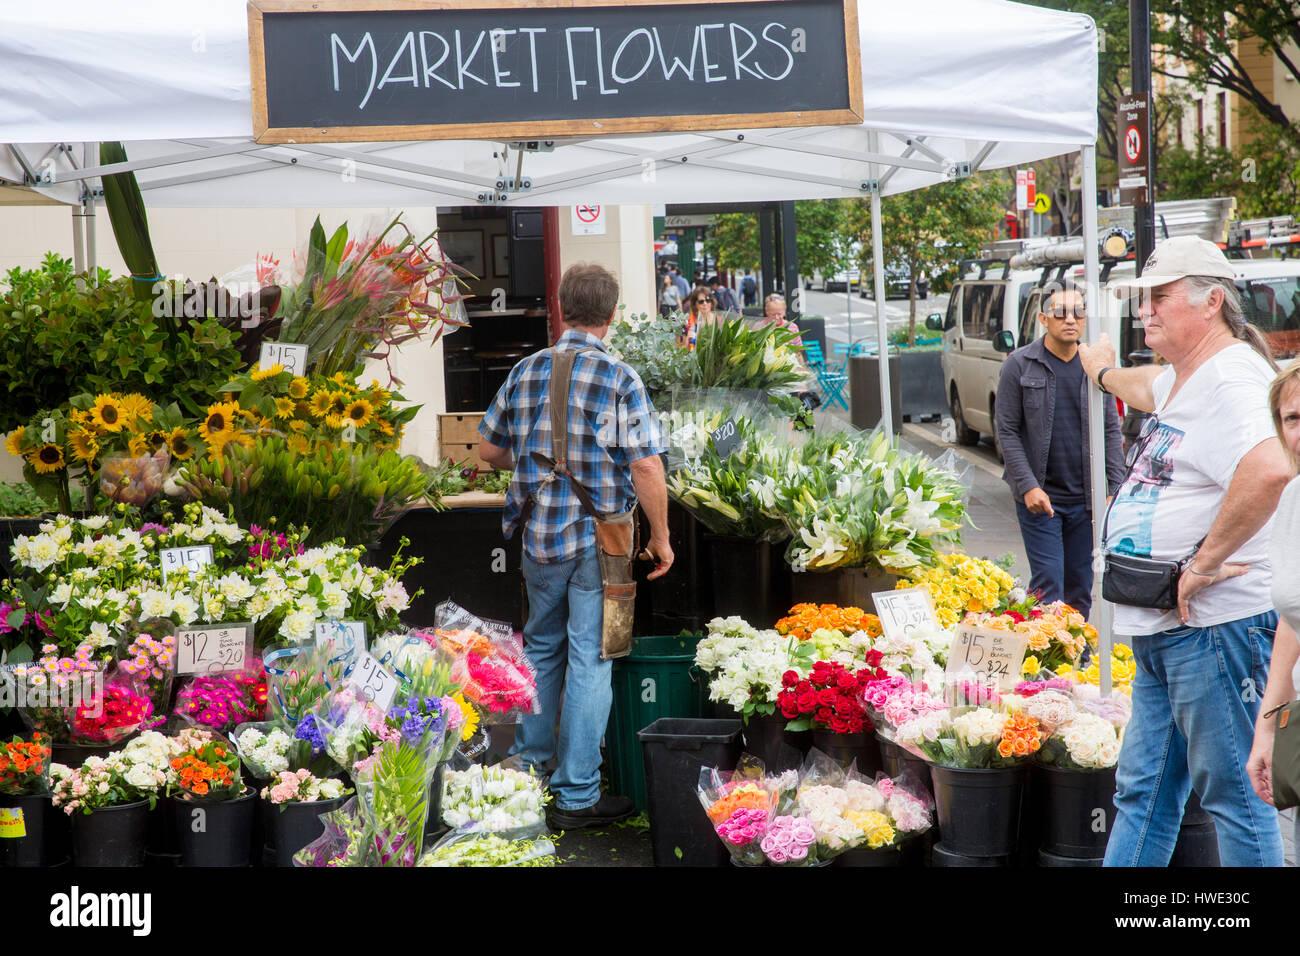 Market stalls in the famous Rocks market in Argyle street, The Rocks,Sydney,Australia - Stock Image